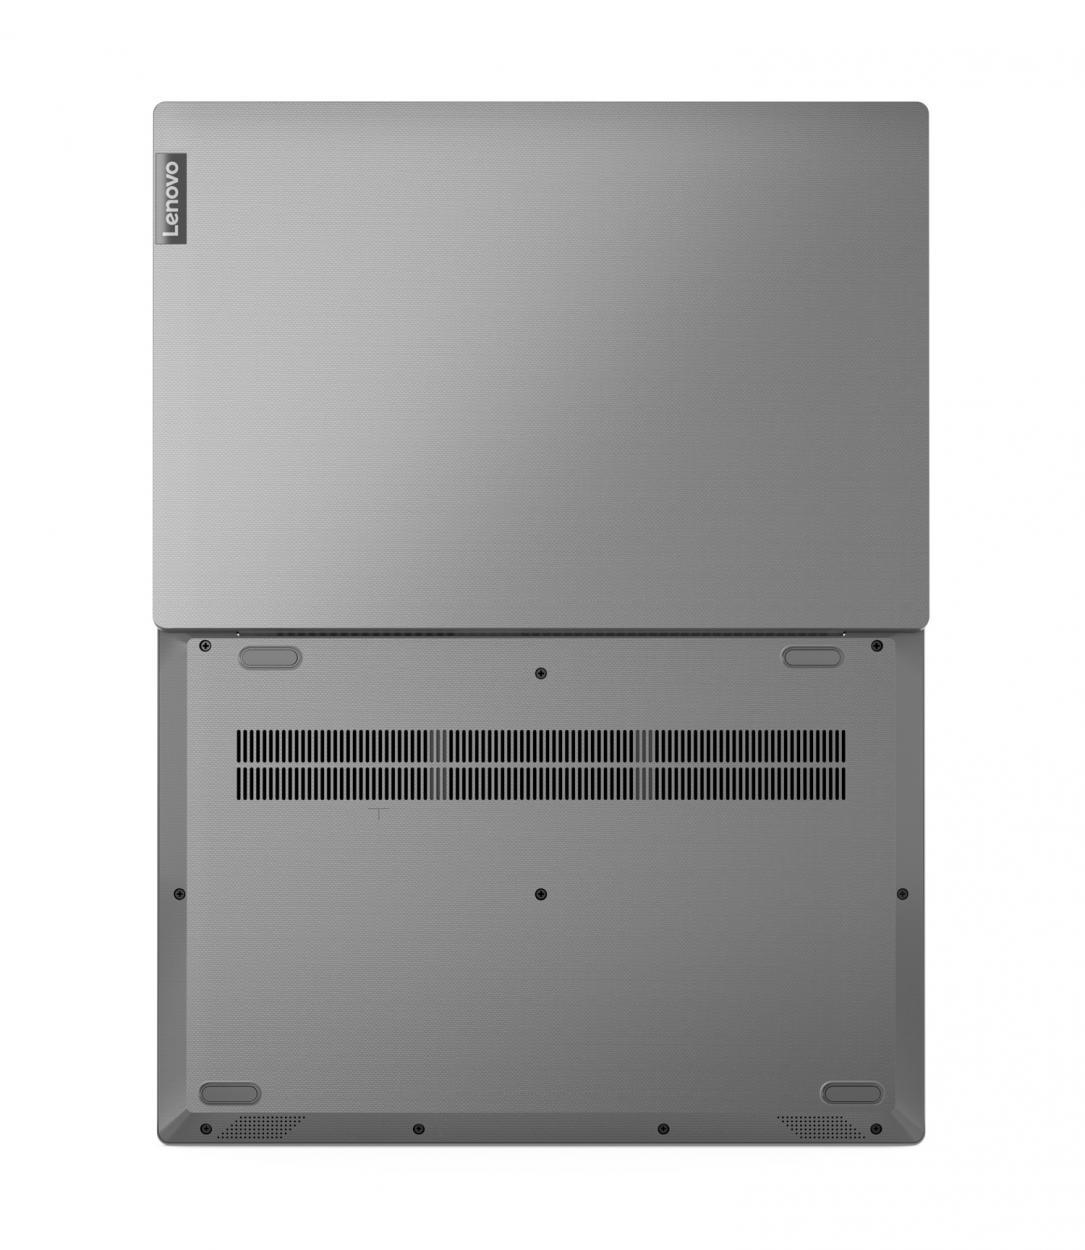 Ordinateur portable Lenovo V15-IIL (82C500HGFR) Argent - i5, SSD 256 Go - photo 4